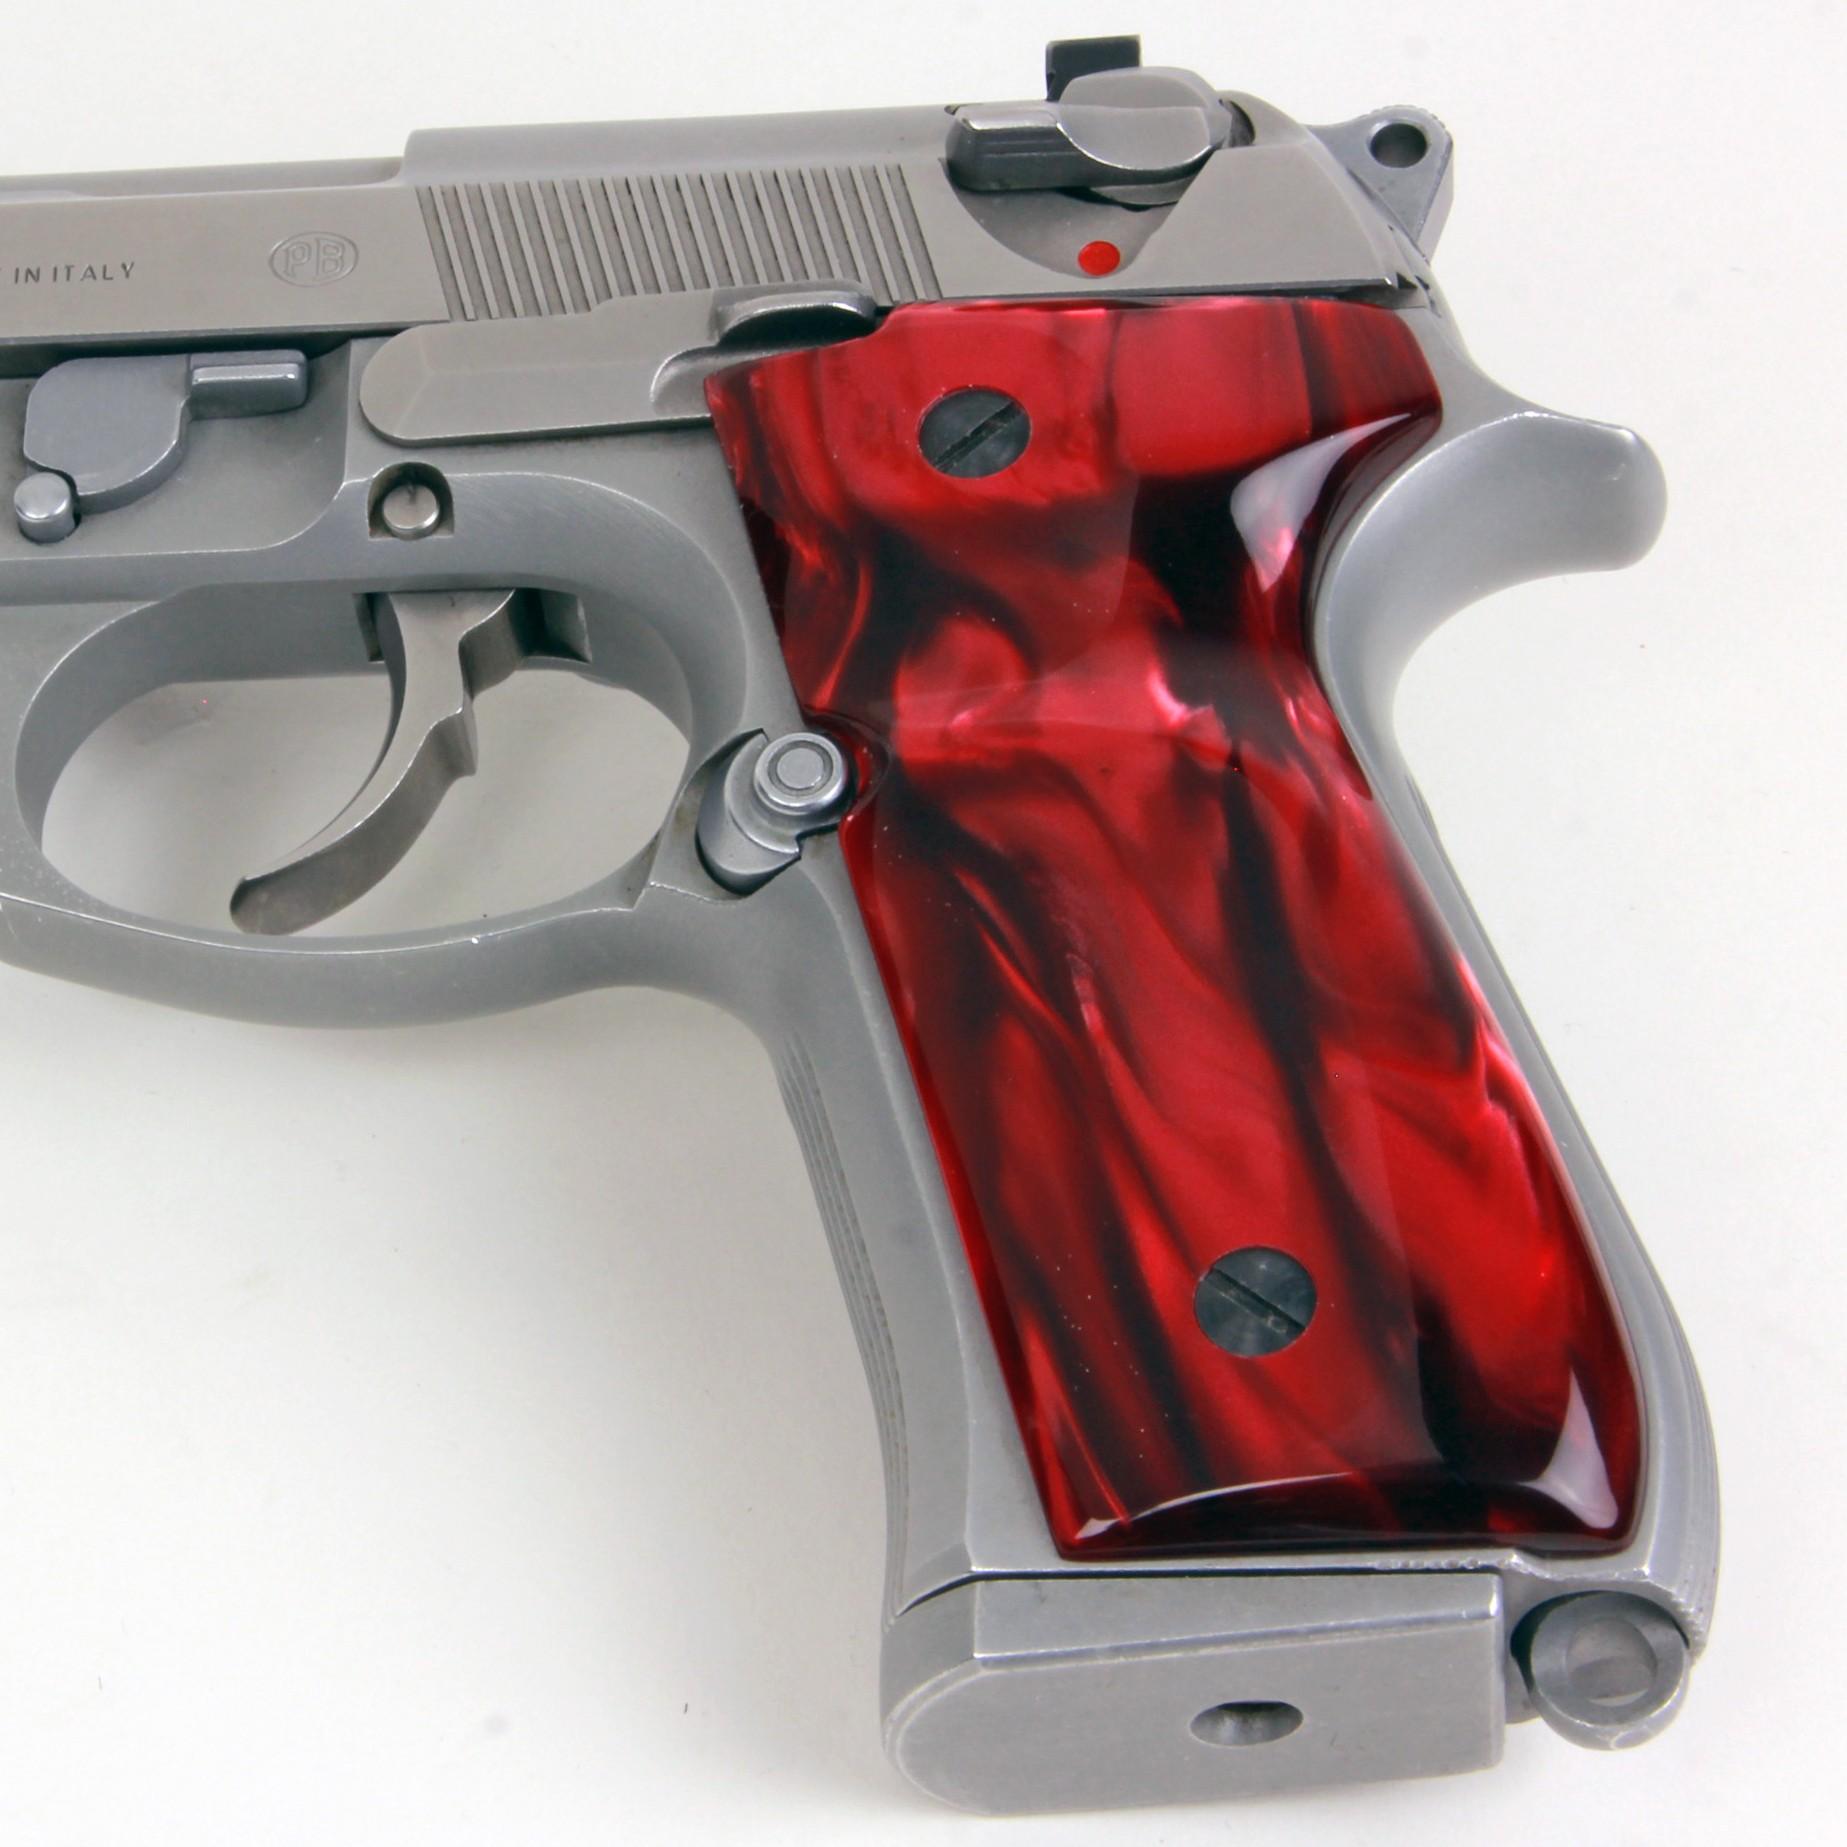 Beretta 92 M9 Series Kirinite Red Pearl Grips